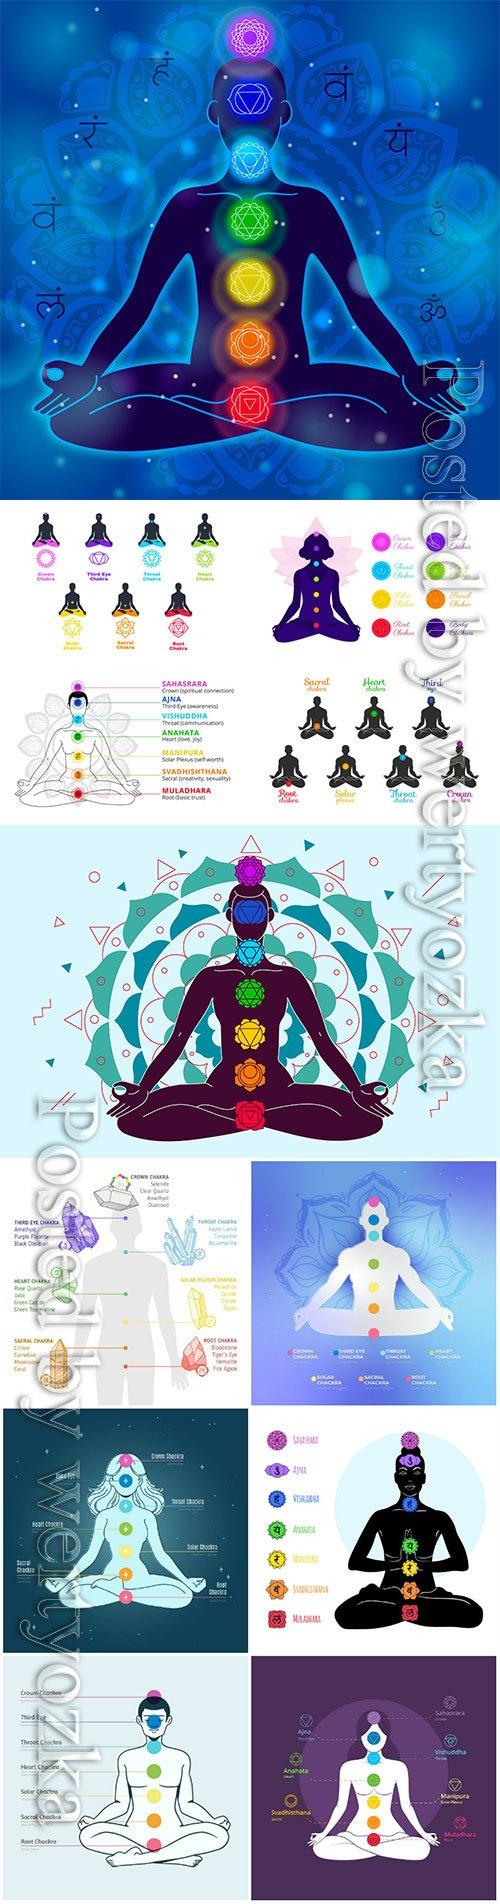 Body chakras concept vector illustration